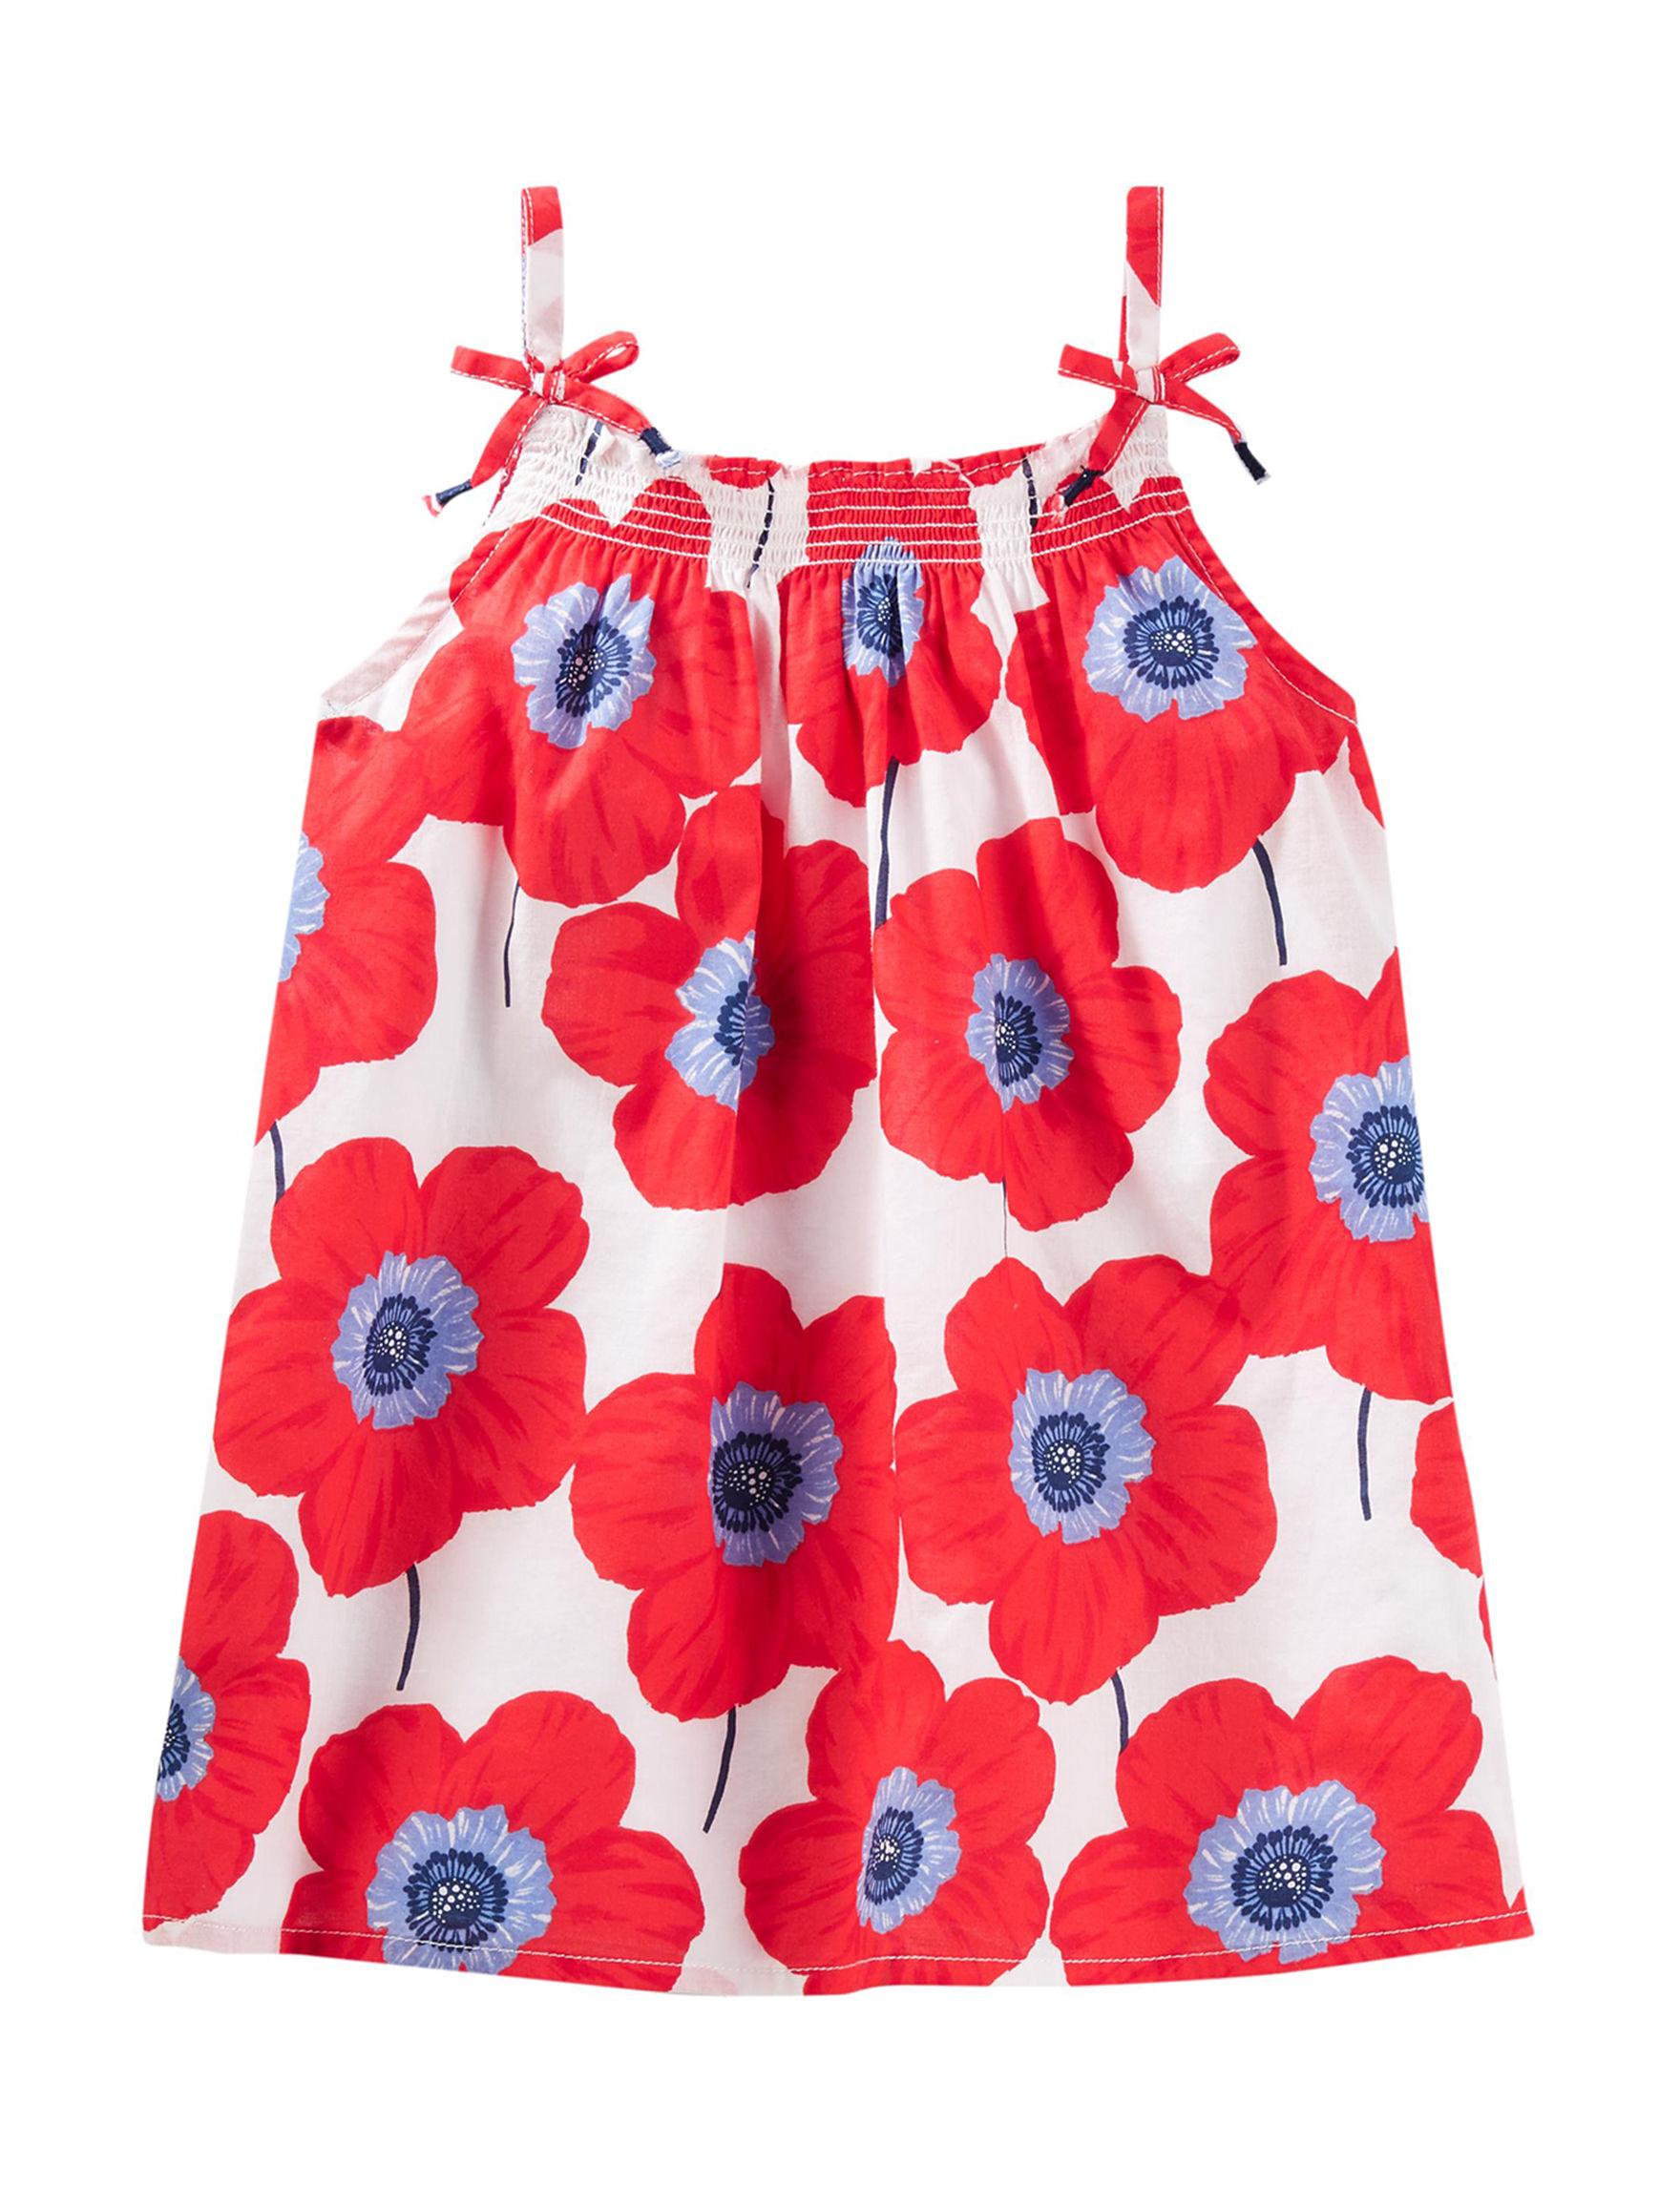 Oshkosh B'Gosh Red Floral Tees & Tanks